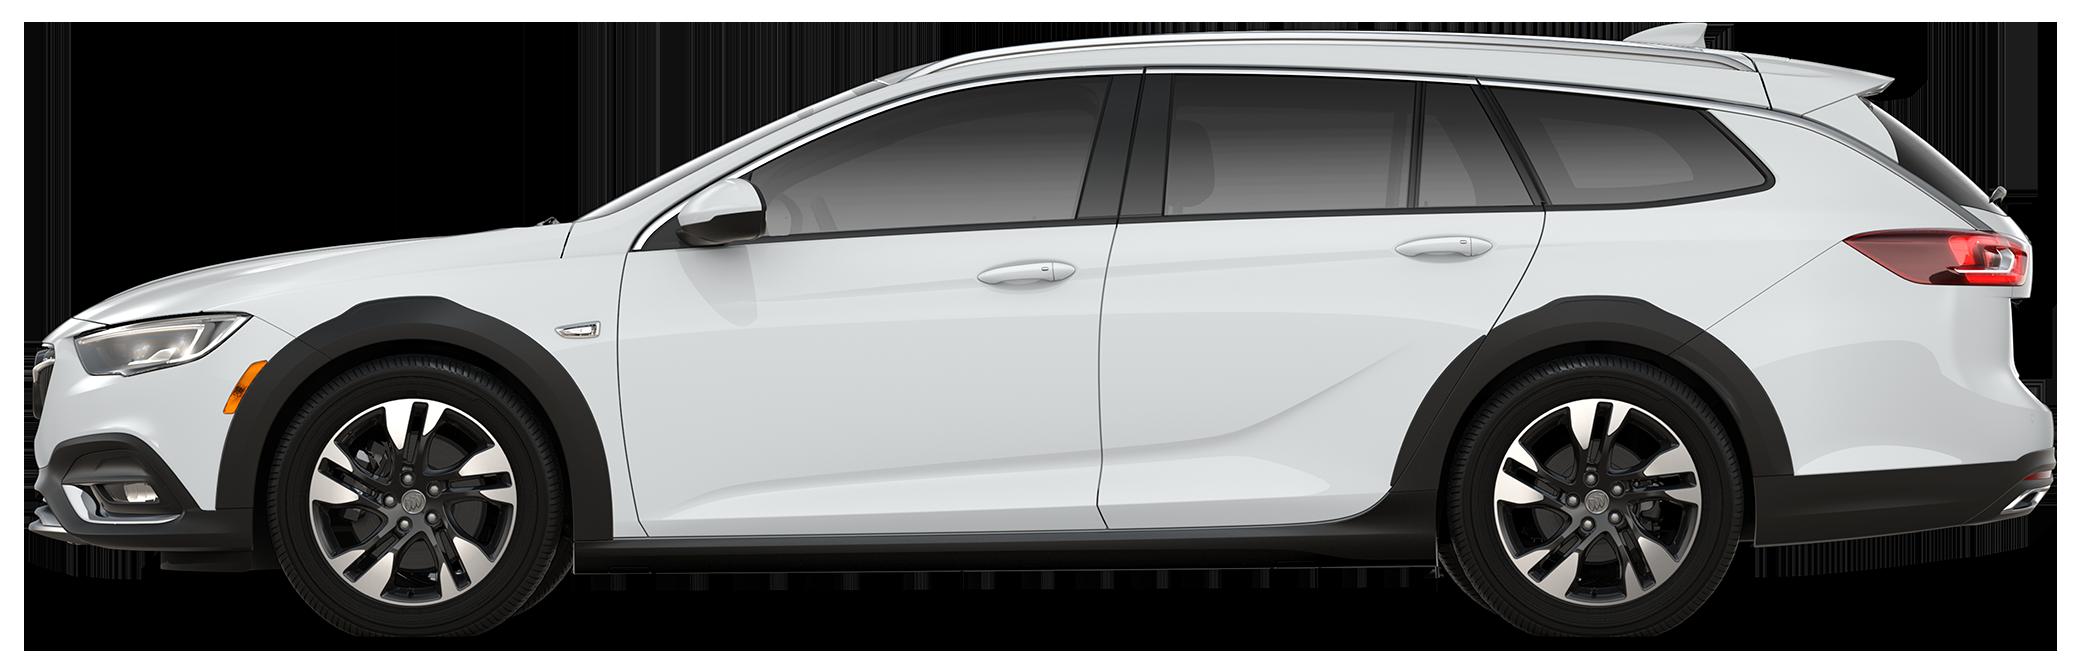 2020 buick regal tourx wagon digital showroom